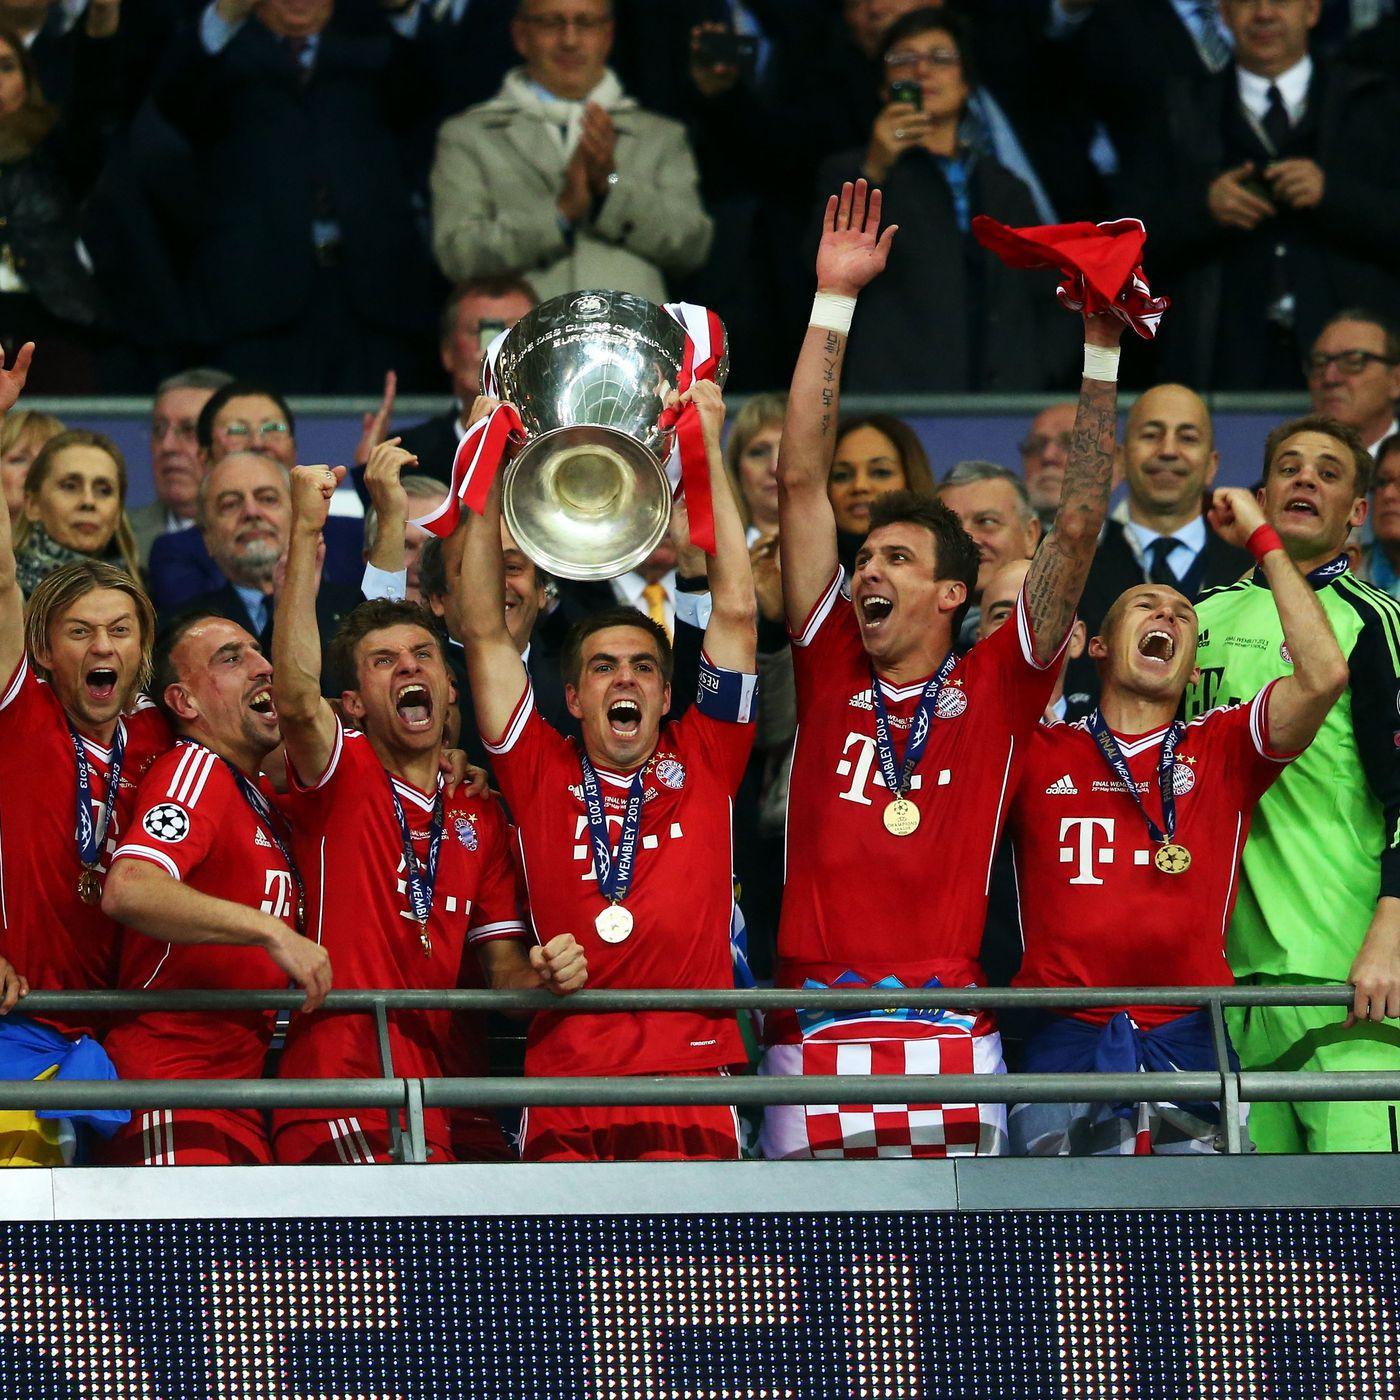 Bayern Munich Vs Borussia Dortmund 2013 Champions League Final Robben Is The Hero Bavarian Football Works